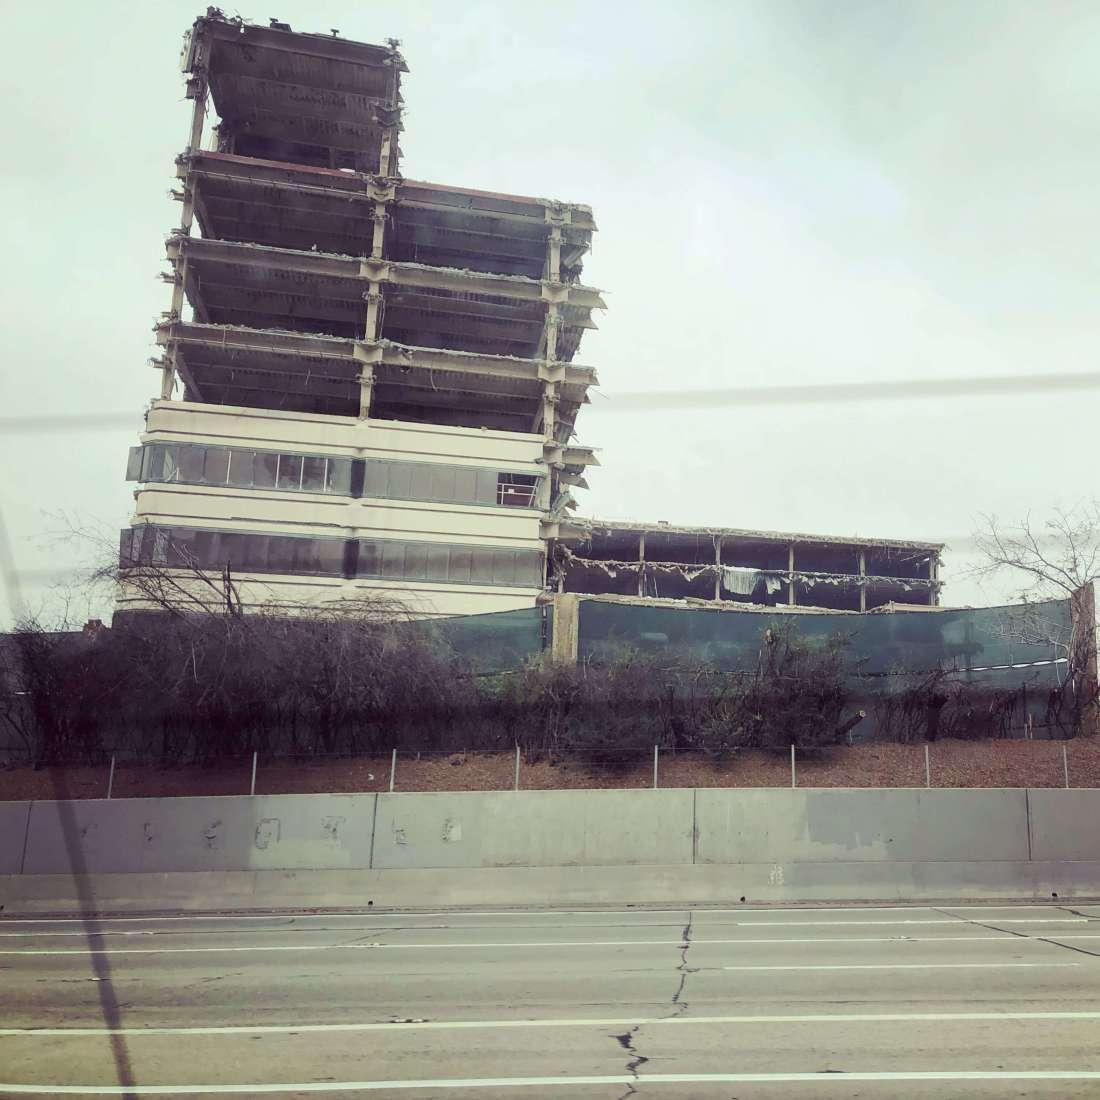 Broken down building in downtown Los Angeles, California